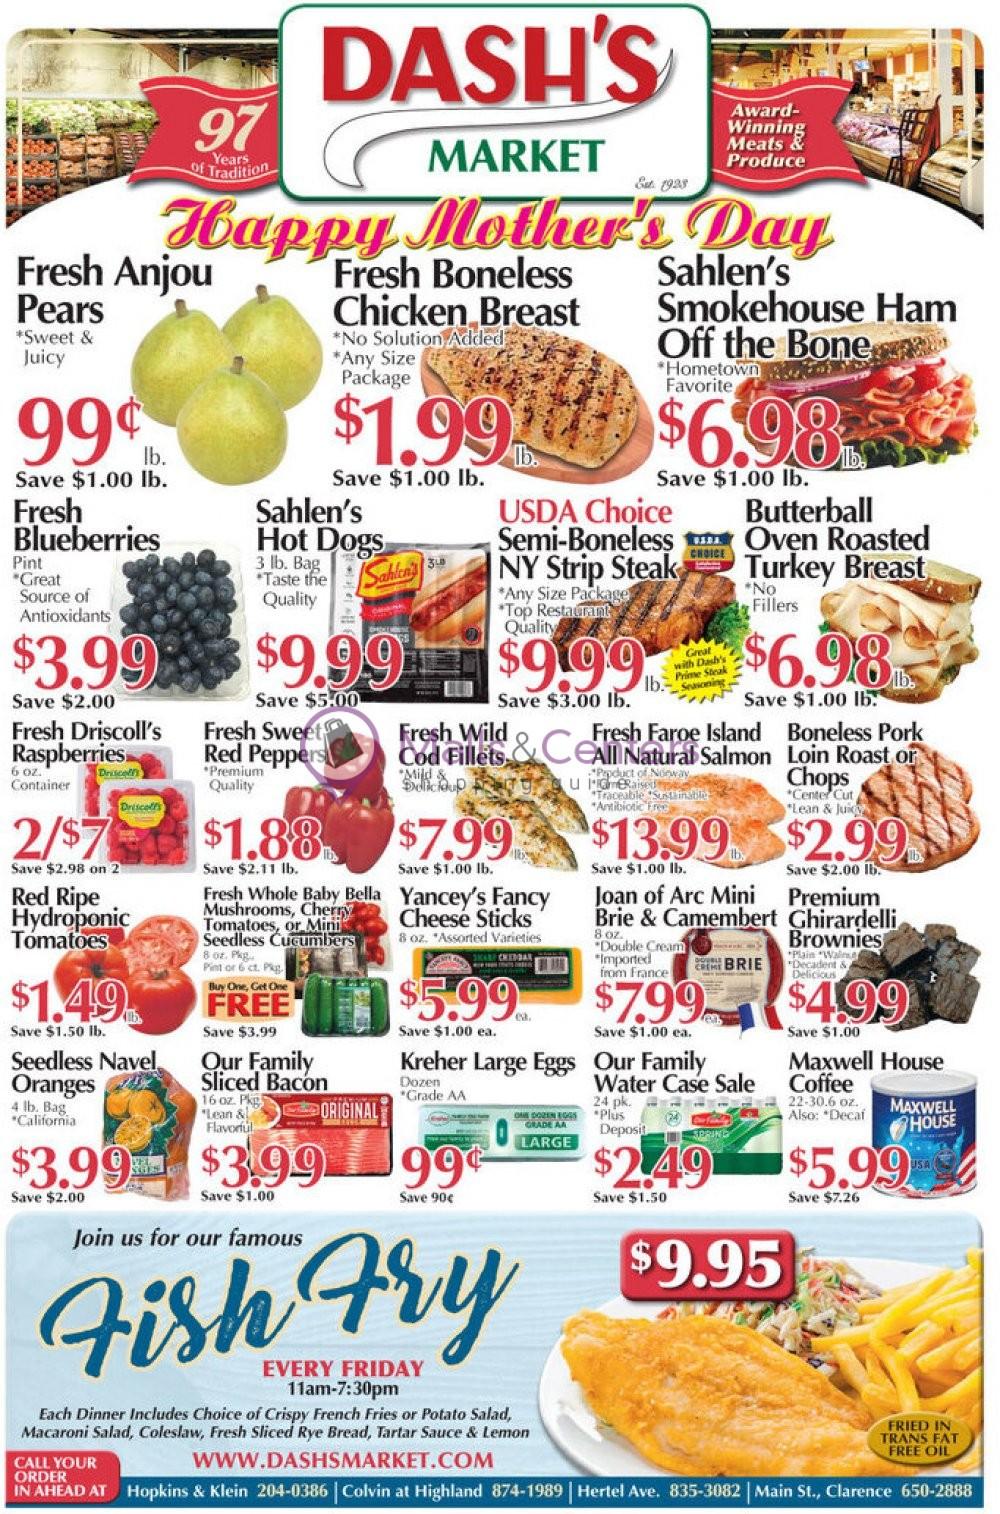 weekly ads Dash's Market - page 1 - mallscenters.com